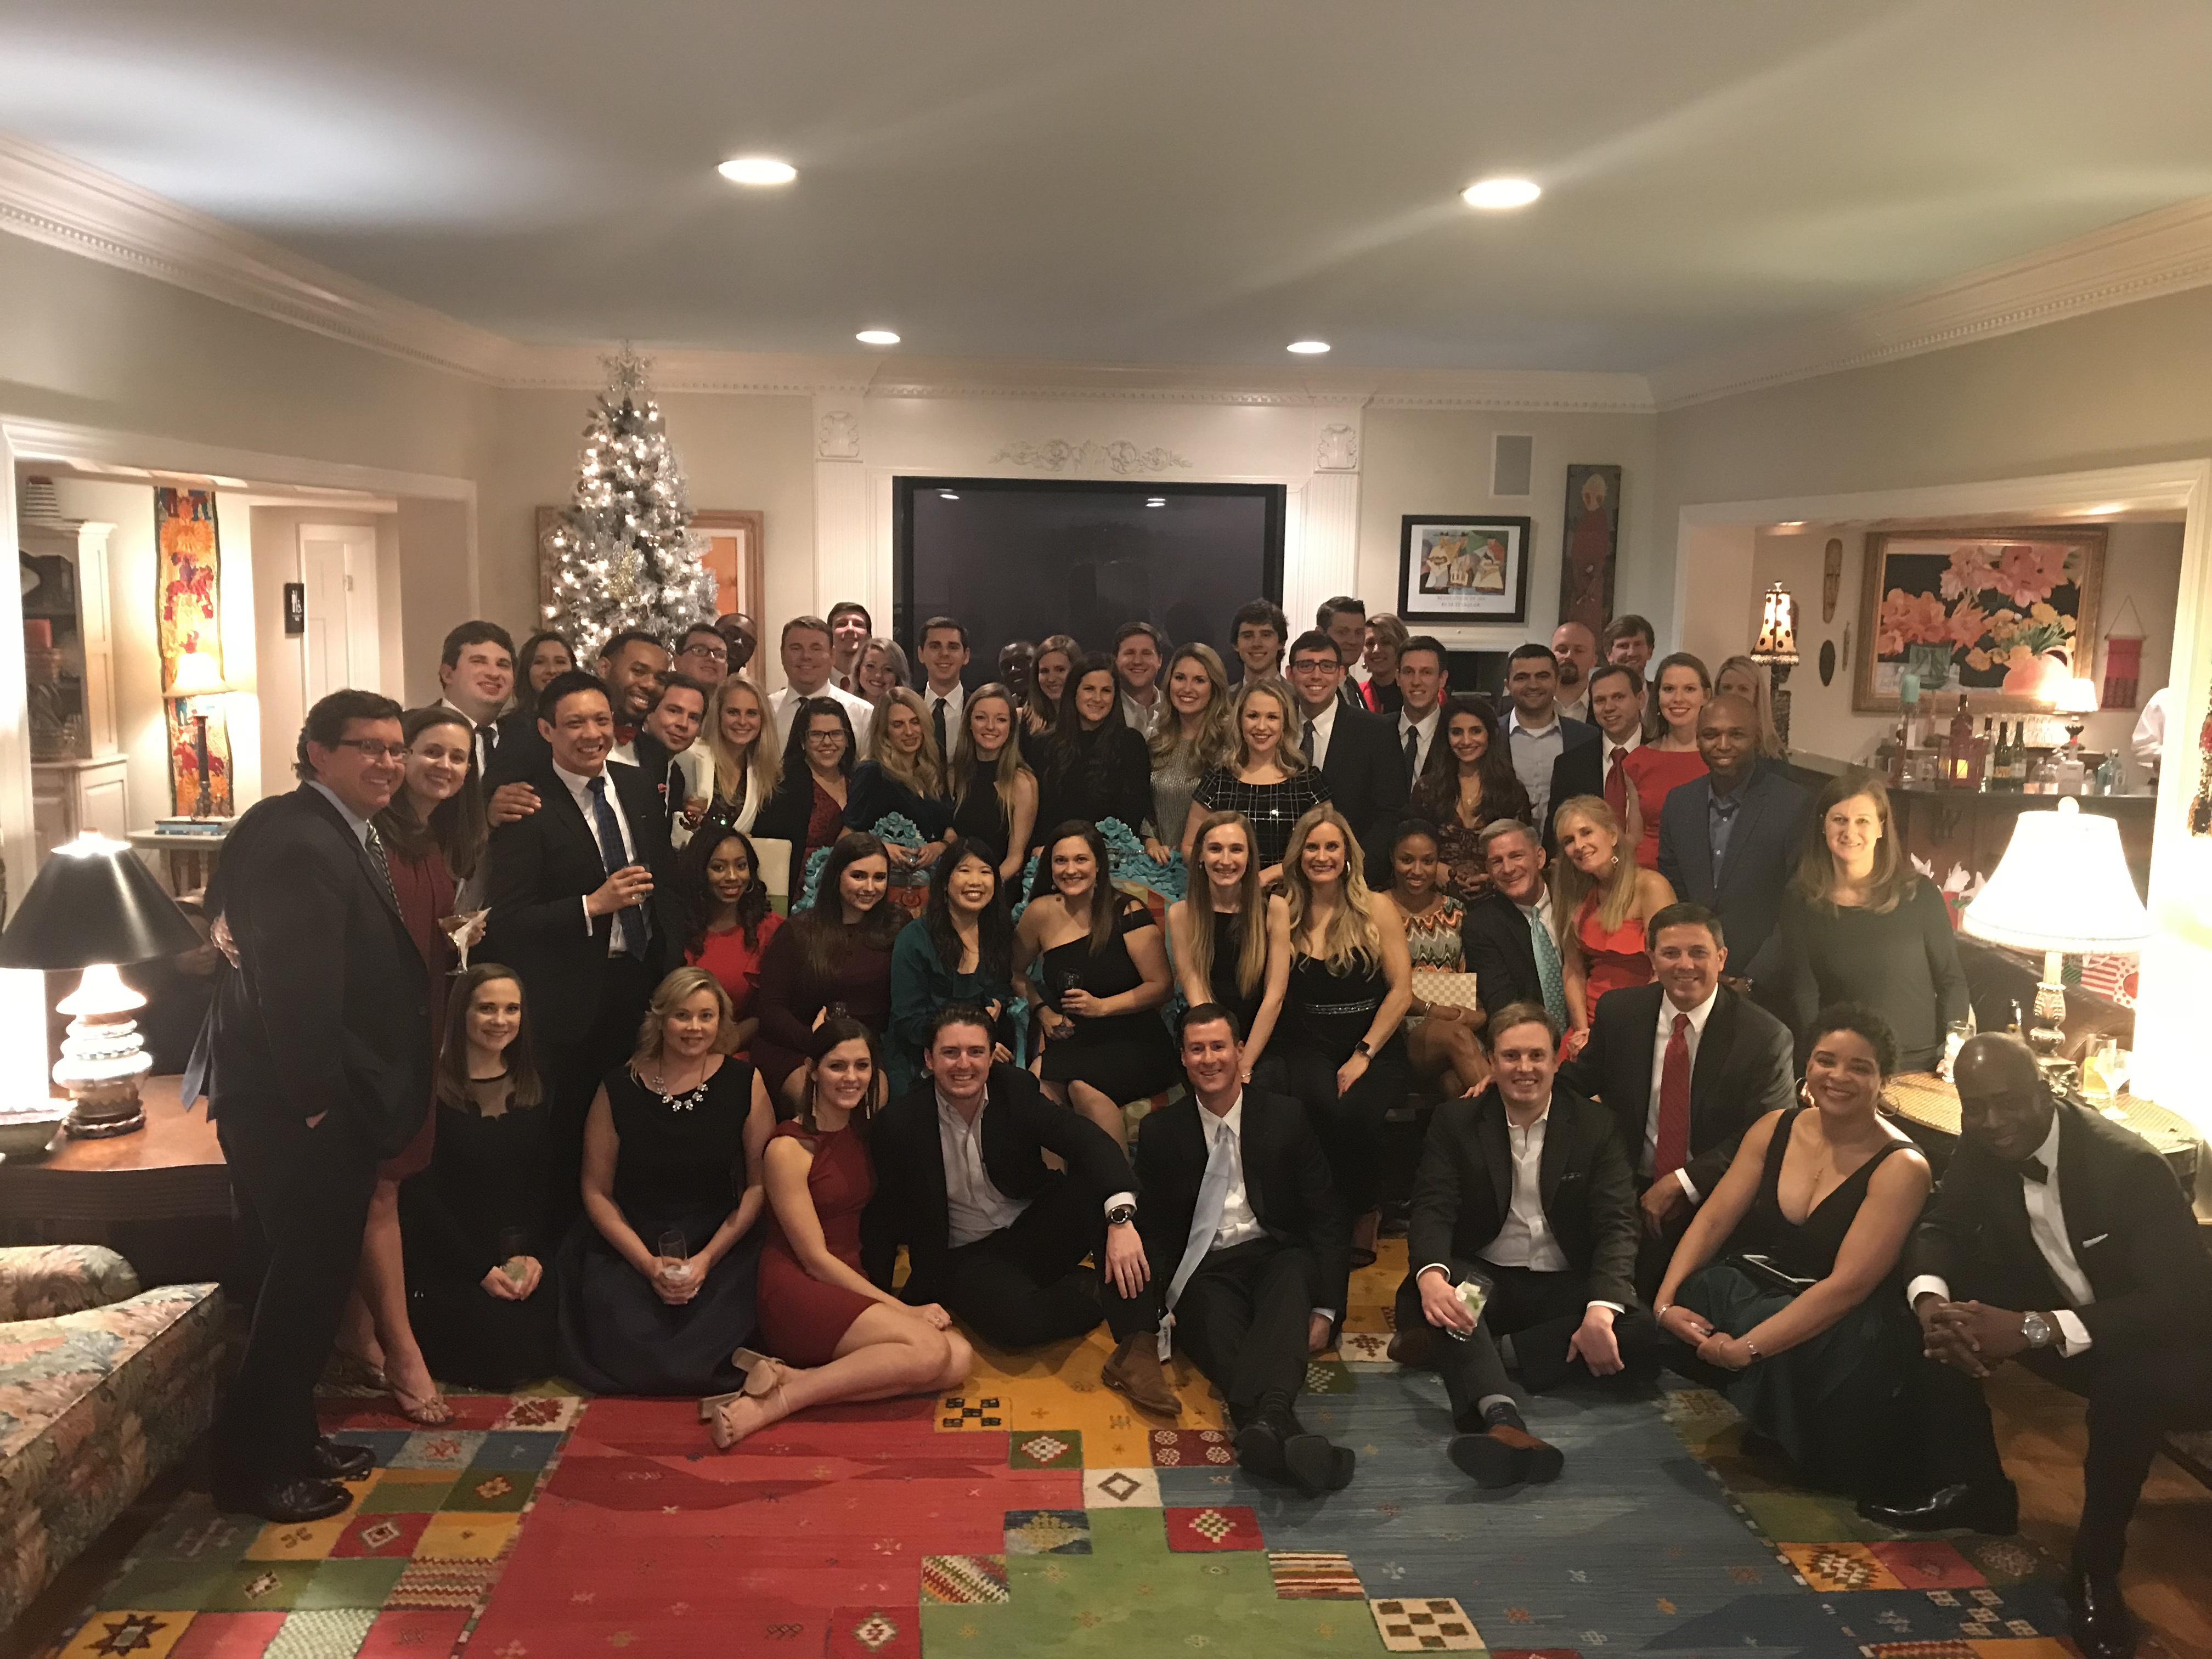 Company Holiday Parties